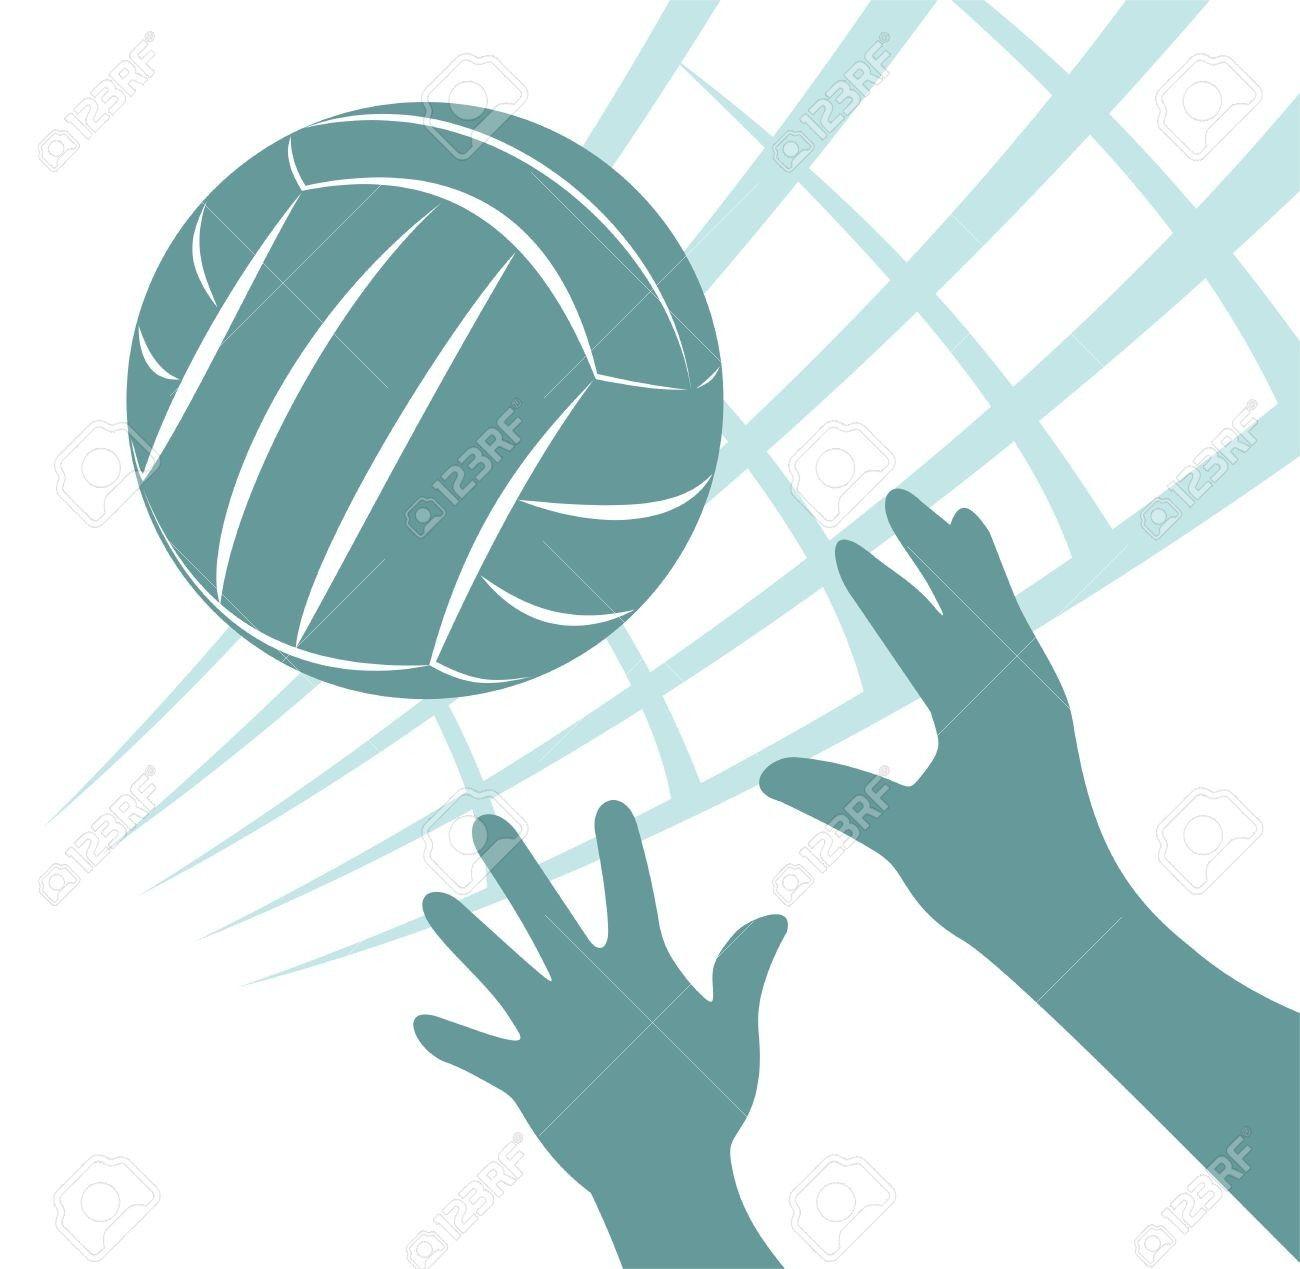 Pin De Van Nguyen En Van Voley Dibujo De Voleibol Fondo De Pantalla De Voleibol